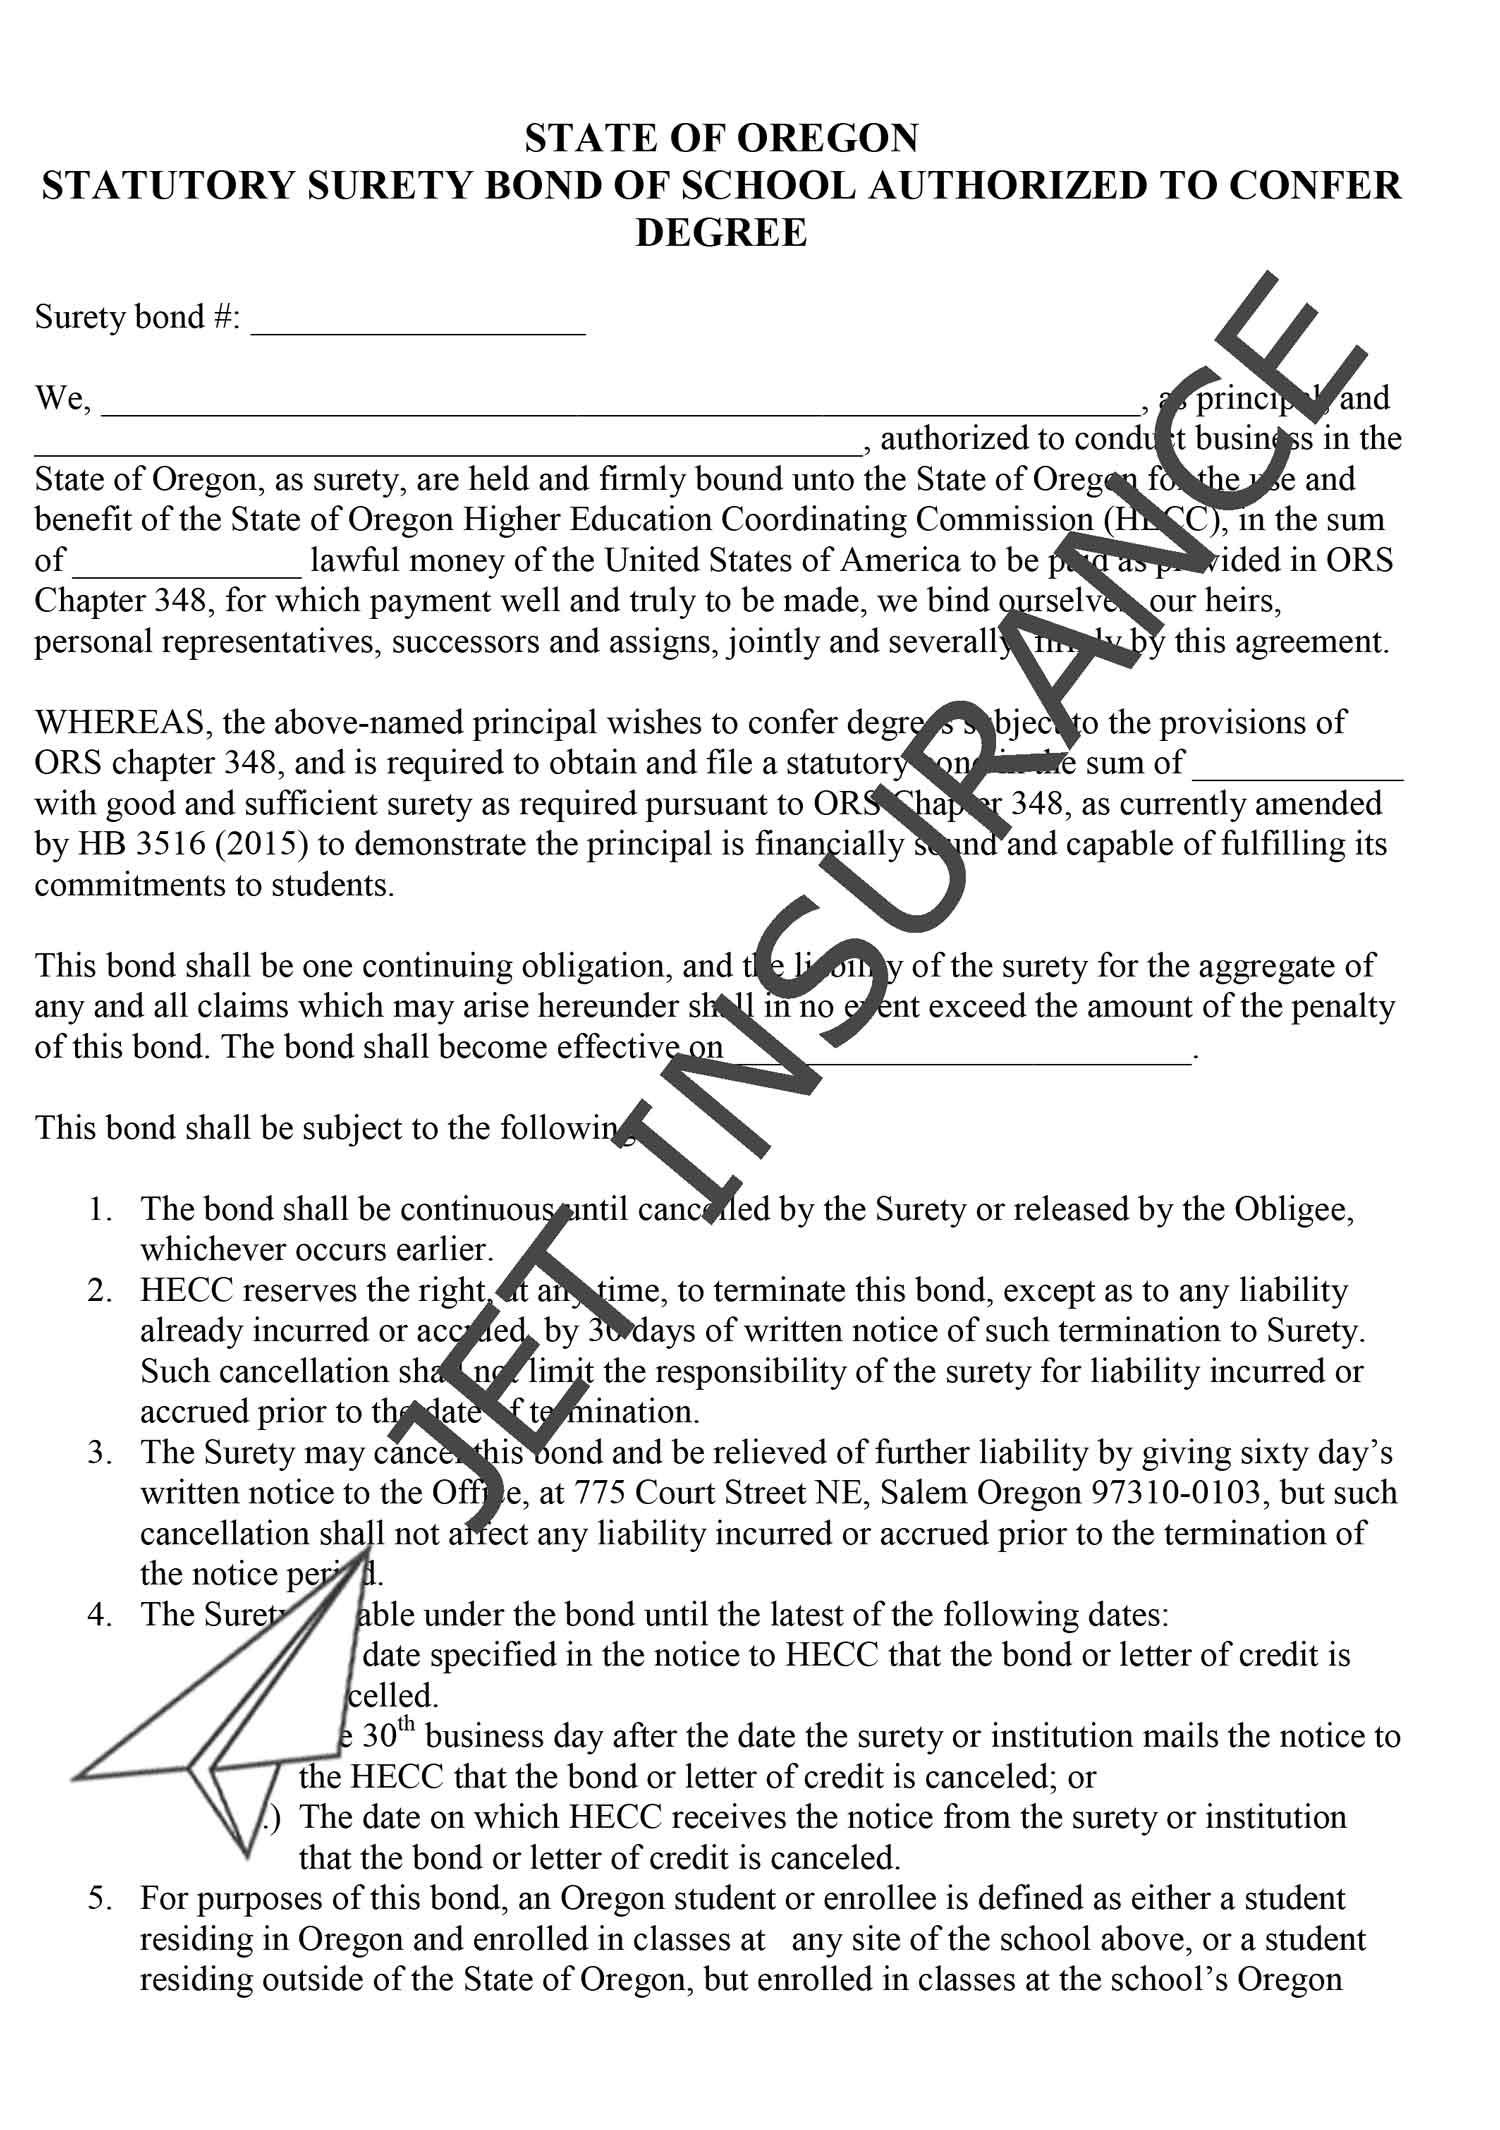 Oregon School Authorized to Confer Degree Bond Form